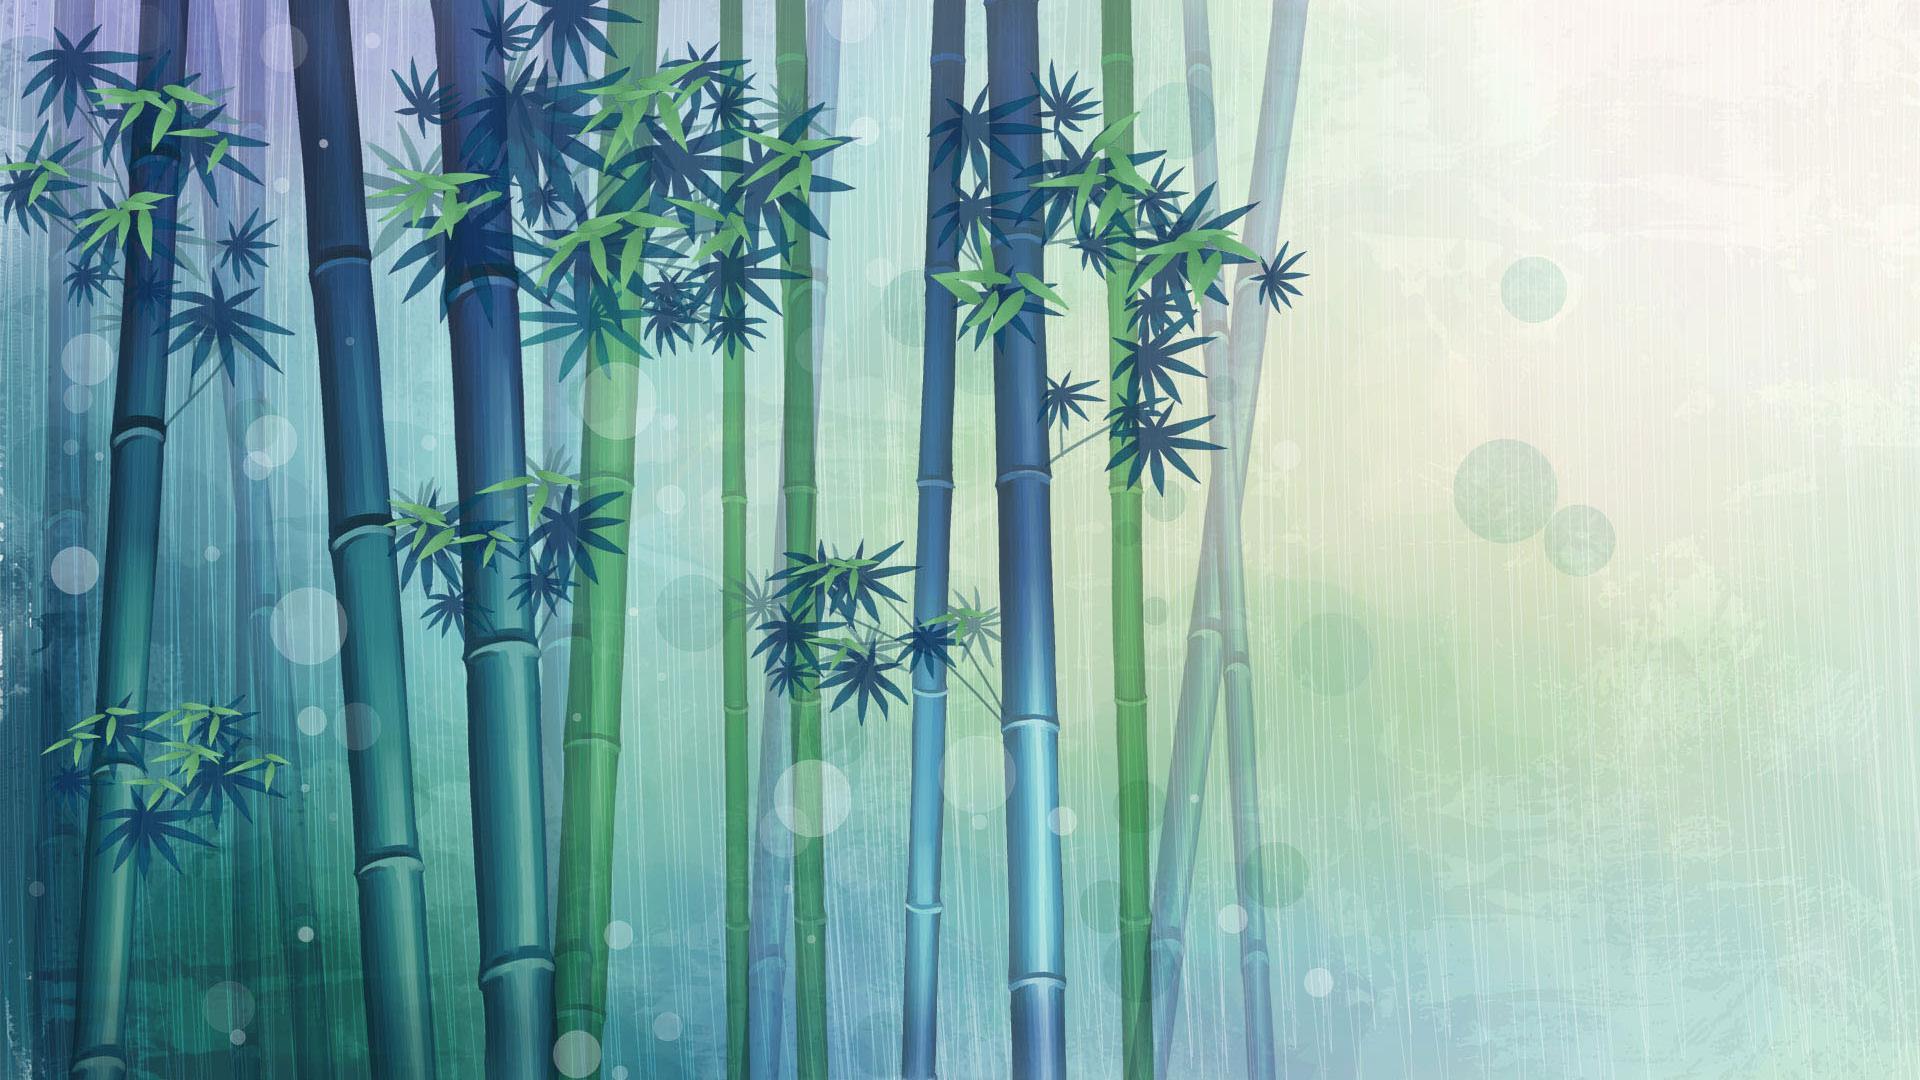 Bamboo desktop wallpapers wallpaper cave for Bamboo mural walls